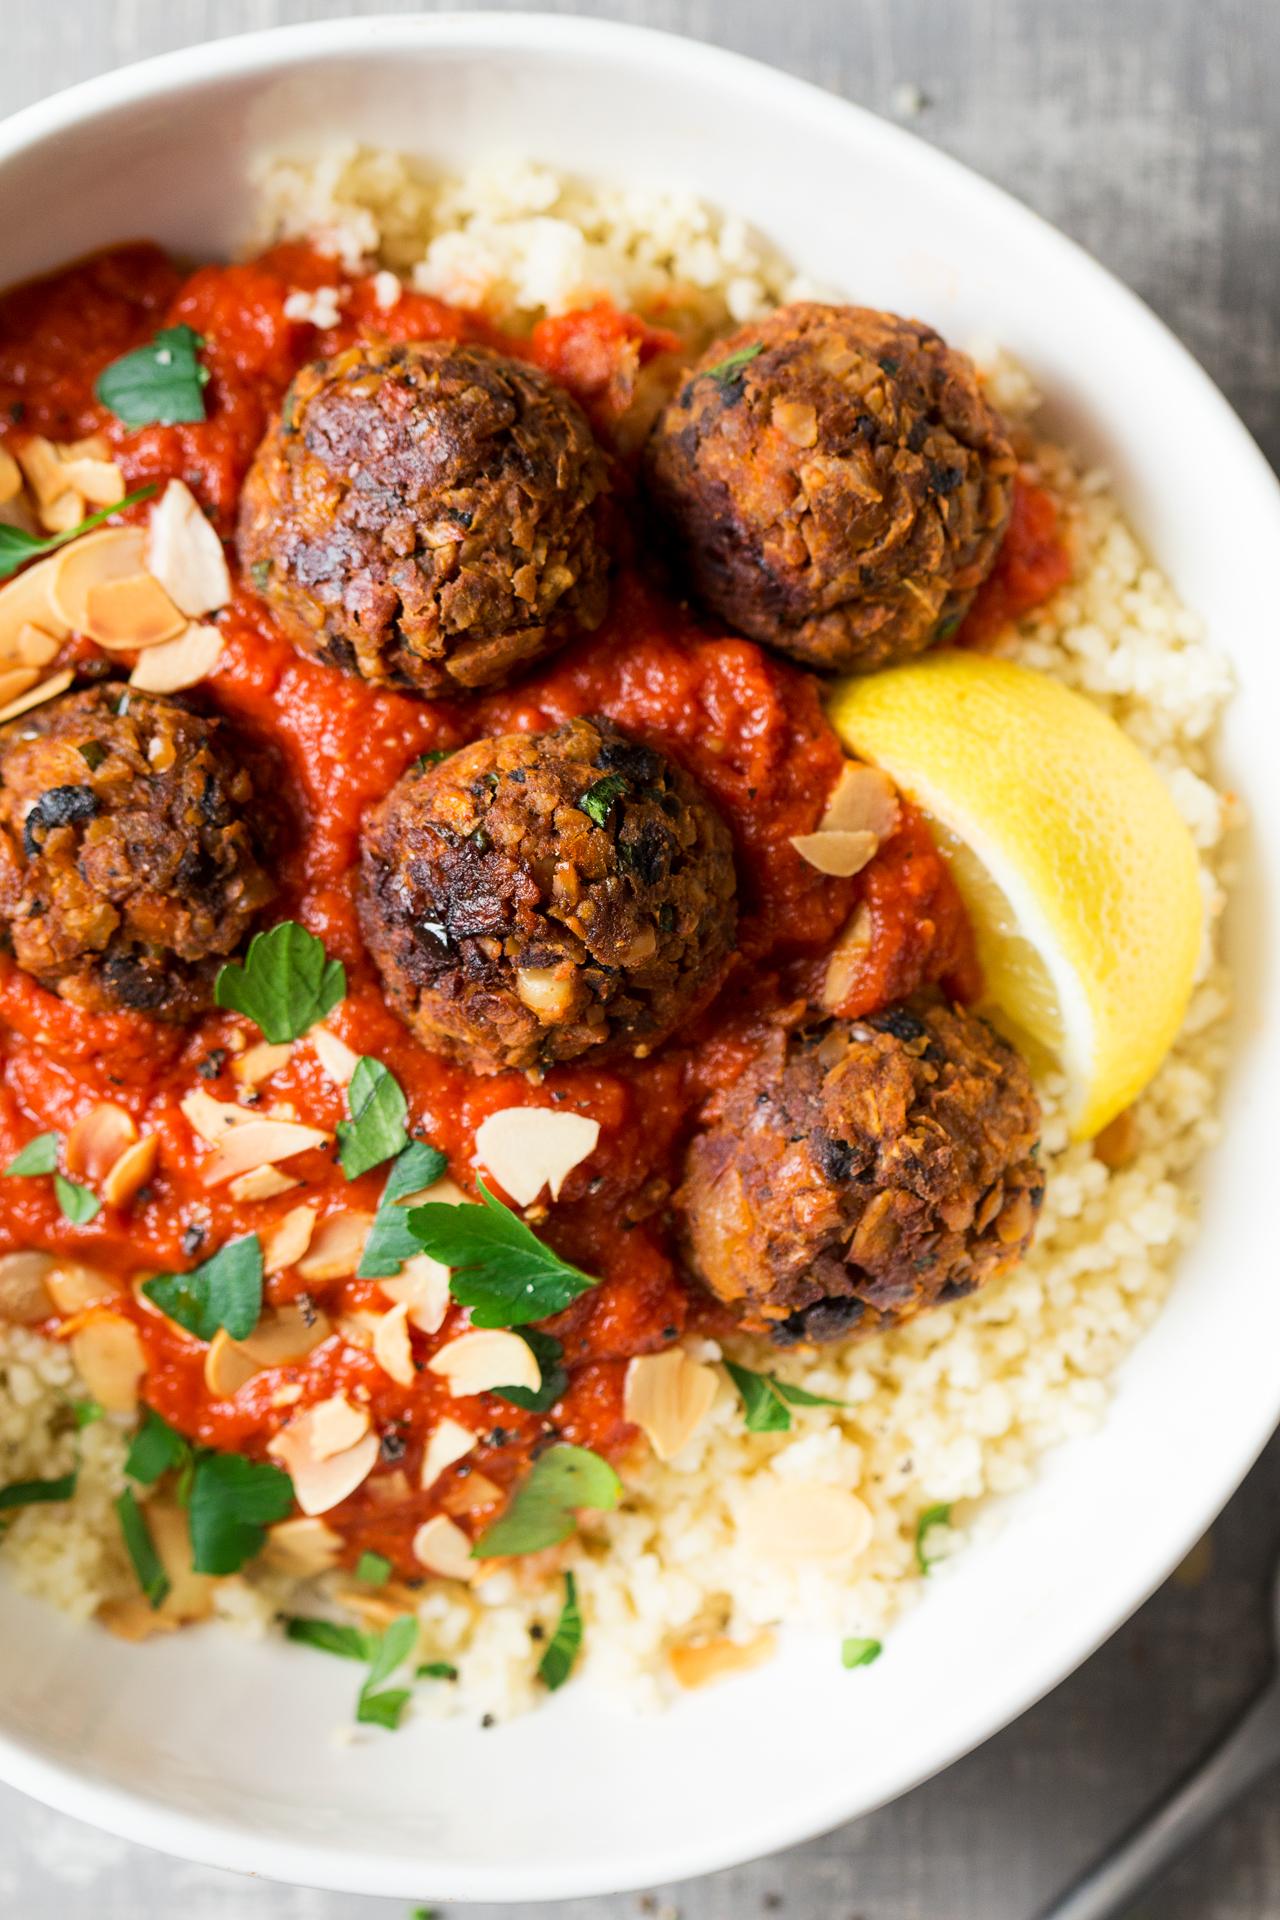 meatballs recipe gluten free  »  8 Image »  Amazing..!